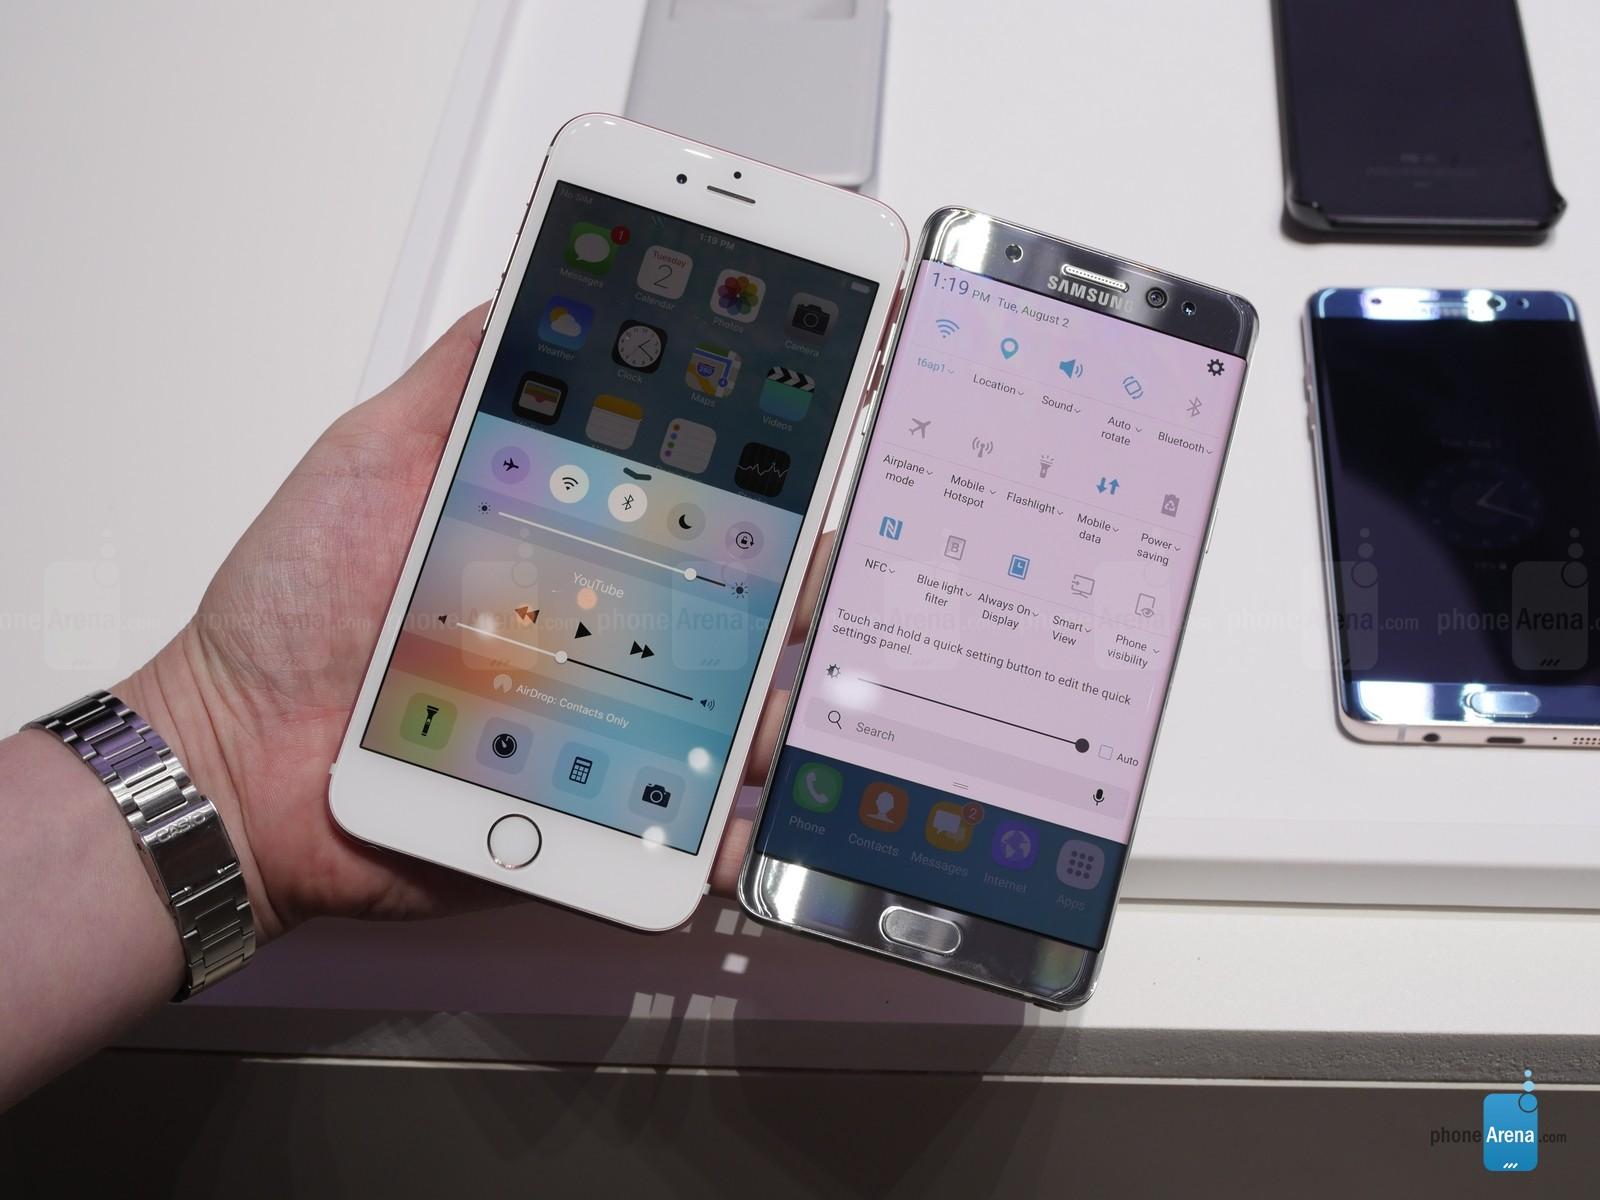 Samsung-Galaxy-Note-7-vs-Apple-iPhonge-6s-Plus